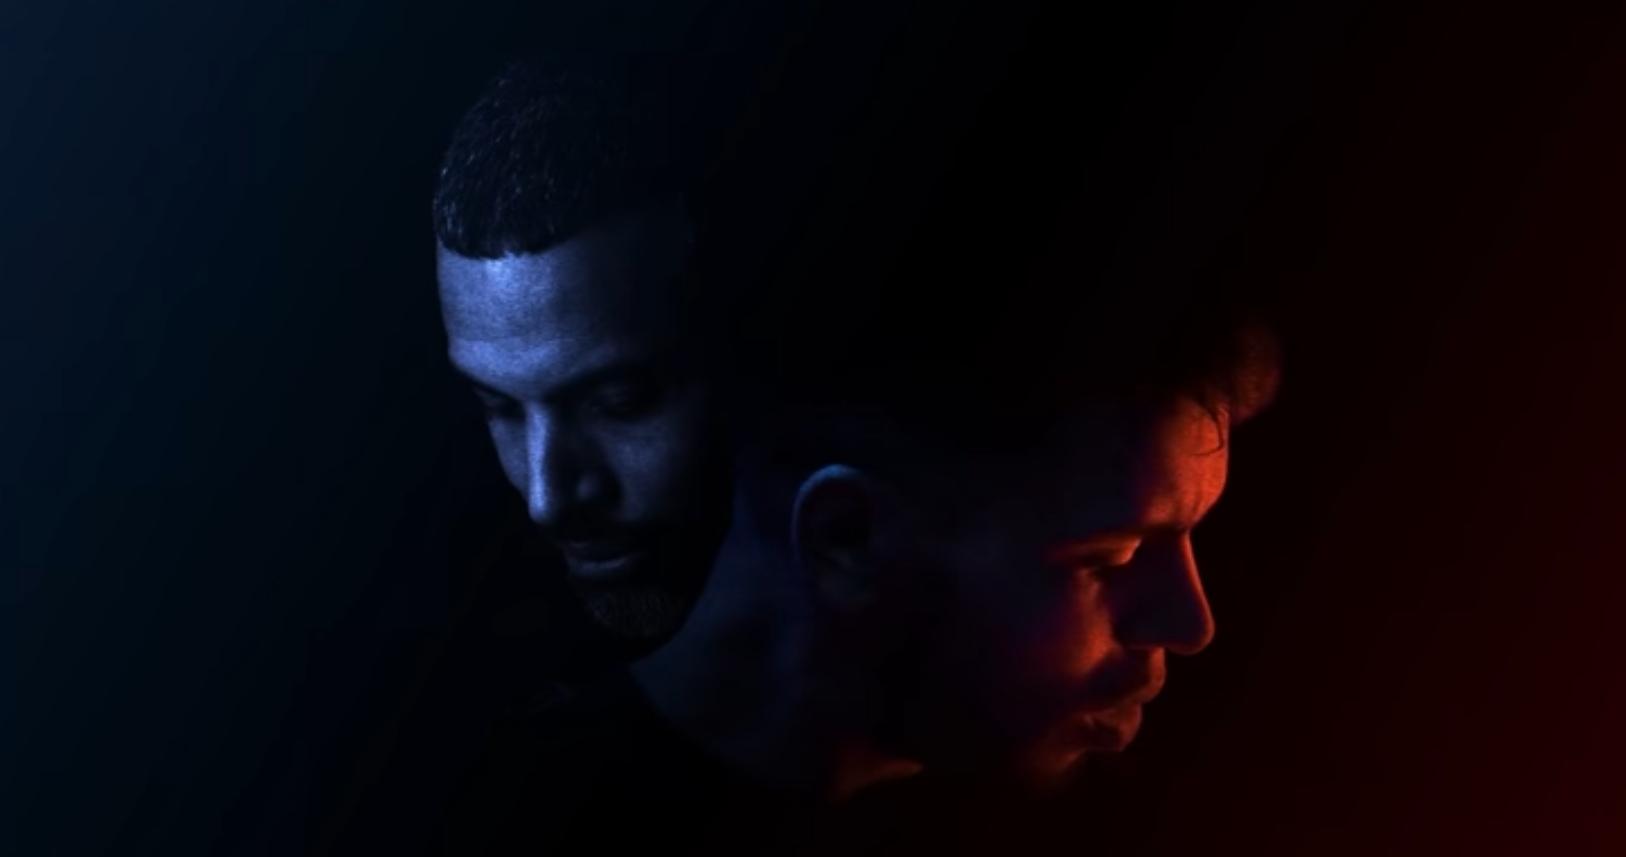 DJ Van يتعاون مع 'الحر' لإعادة توزيع أغنية 'حس بيا'